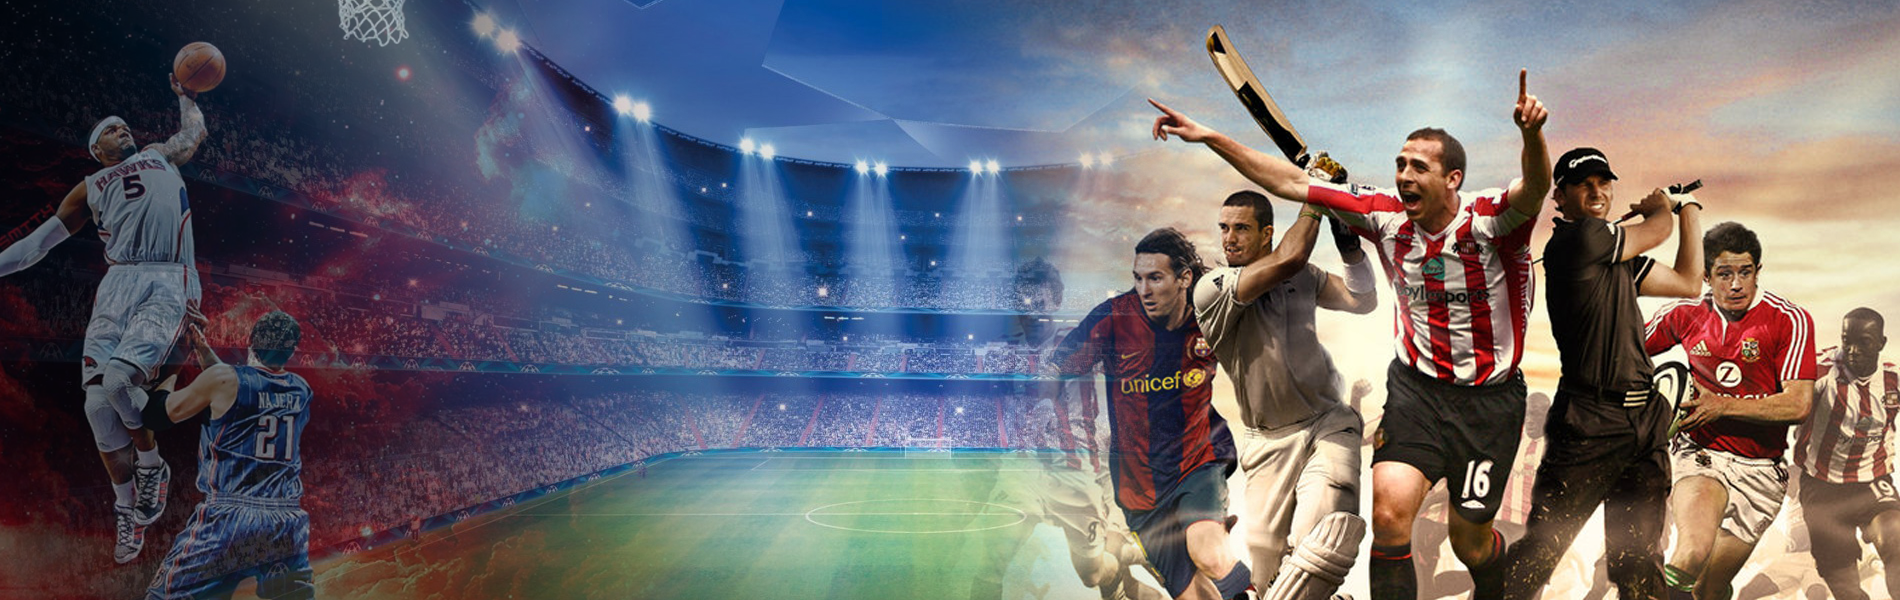 123footballfocus